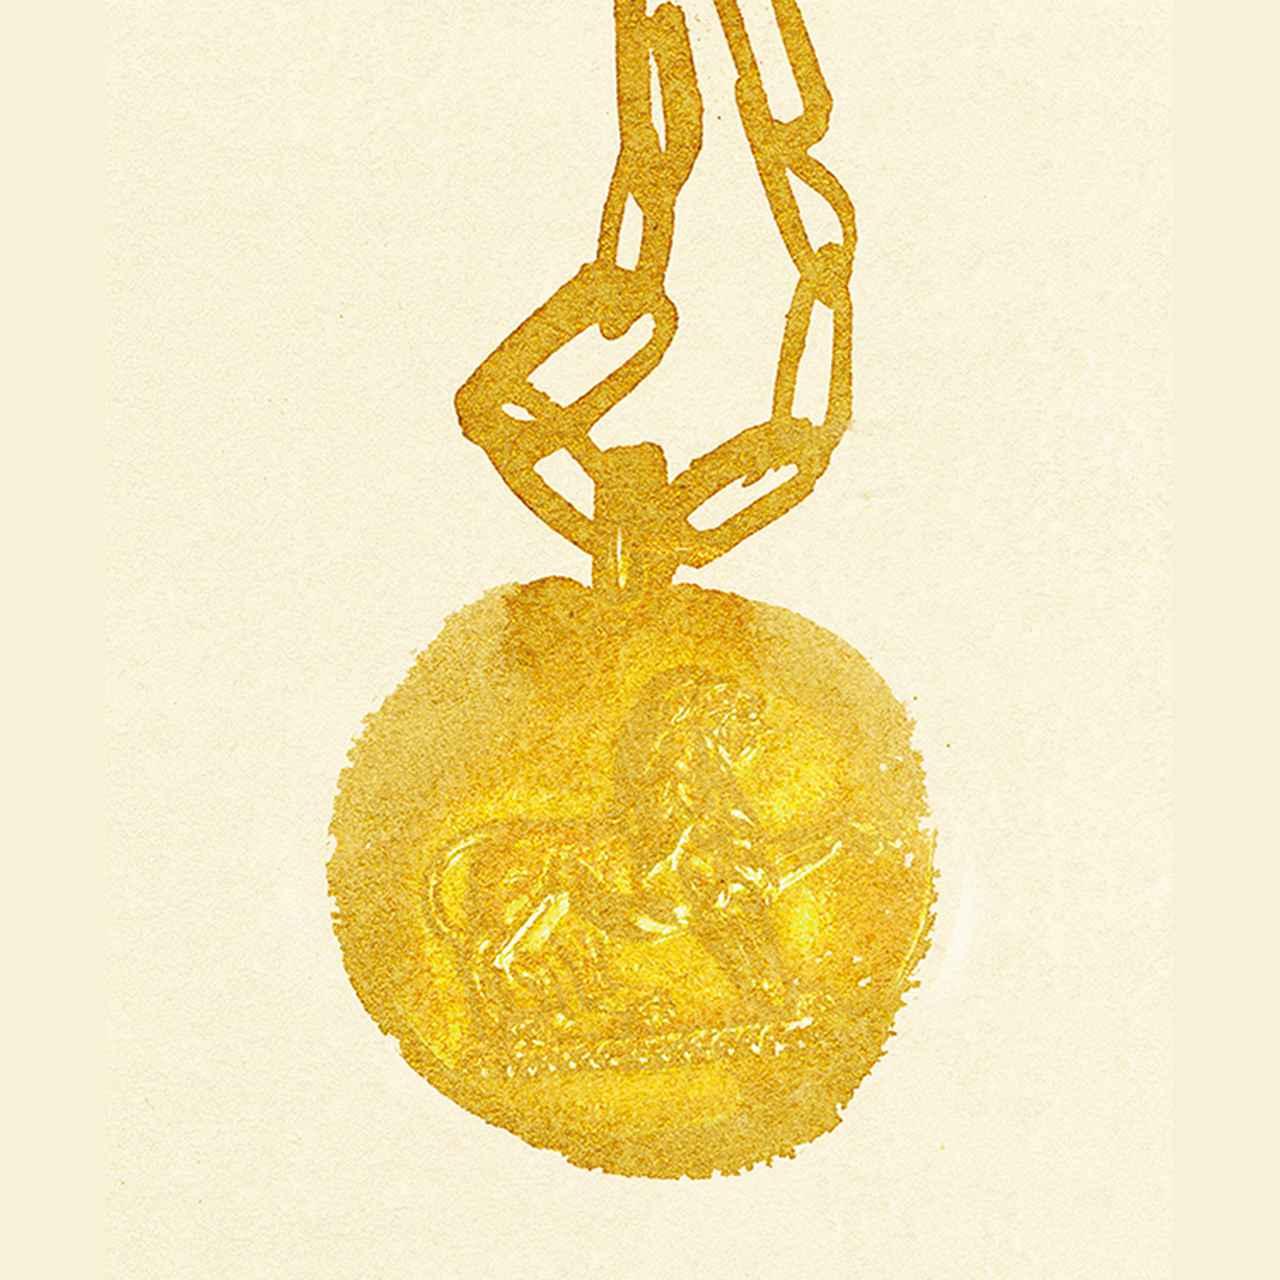 Images : ゴールドの星座のペンダント、ヴァン クリーフ&アーペル、1970年代